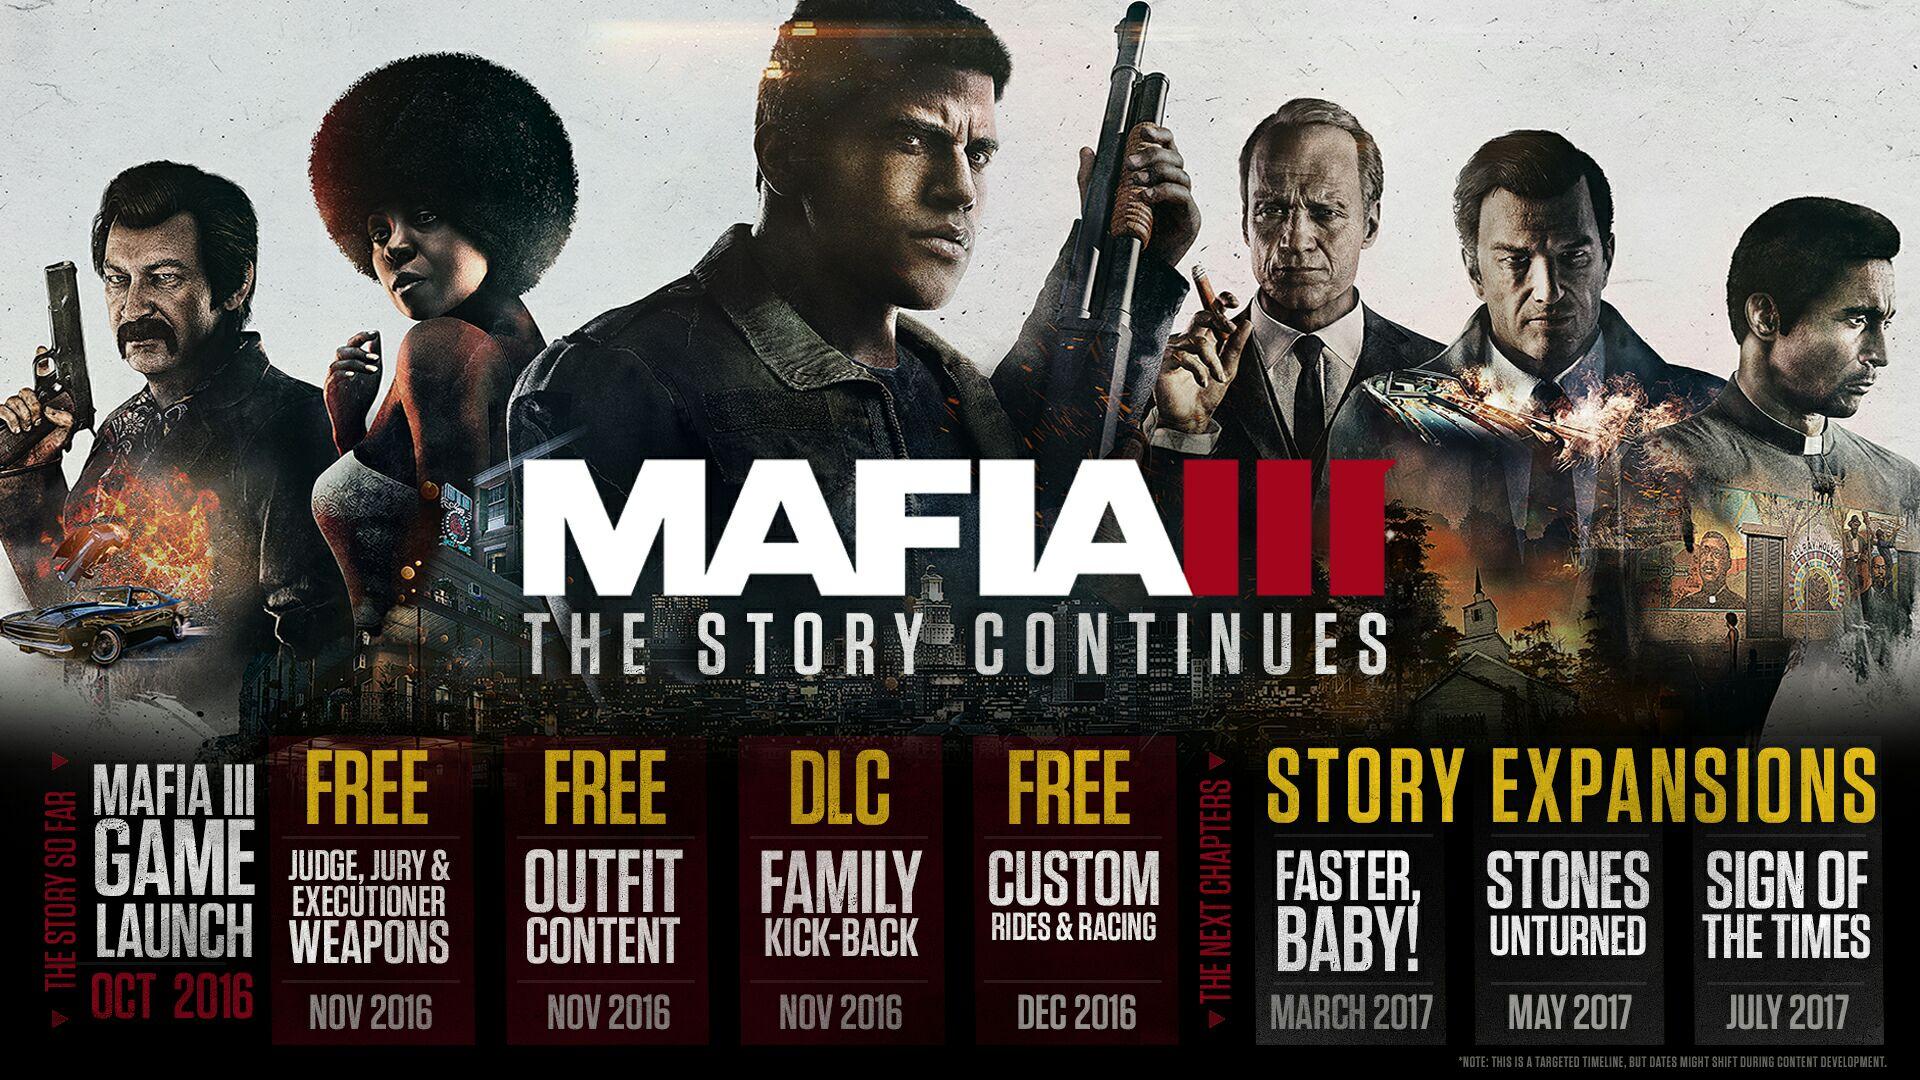 Mafia Iii PS4 Deluxe Edition za niecałe 90 zł @GAME.co.uk